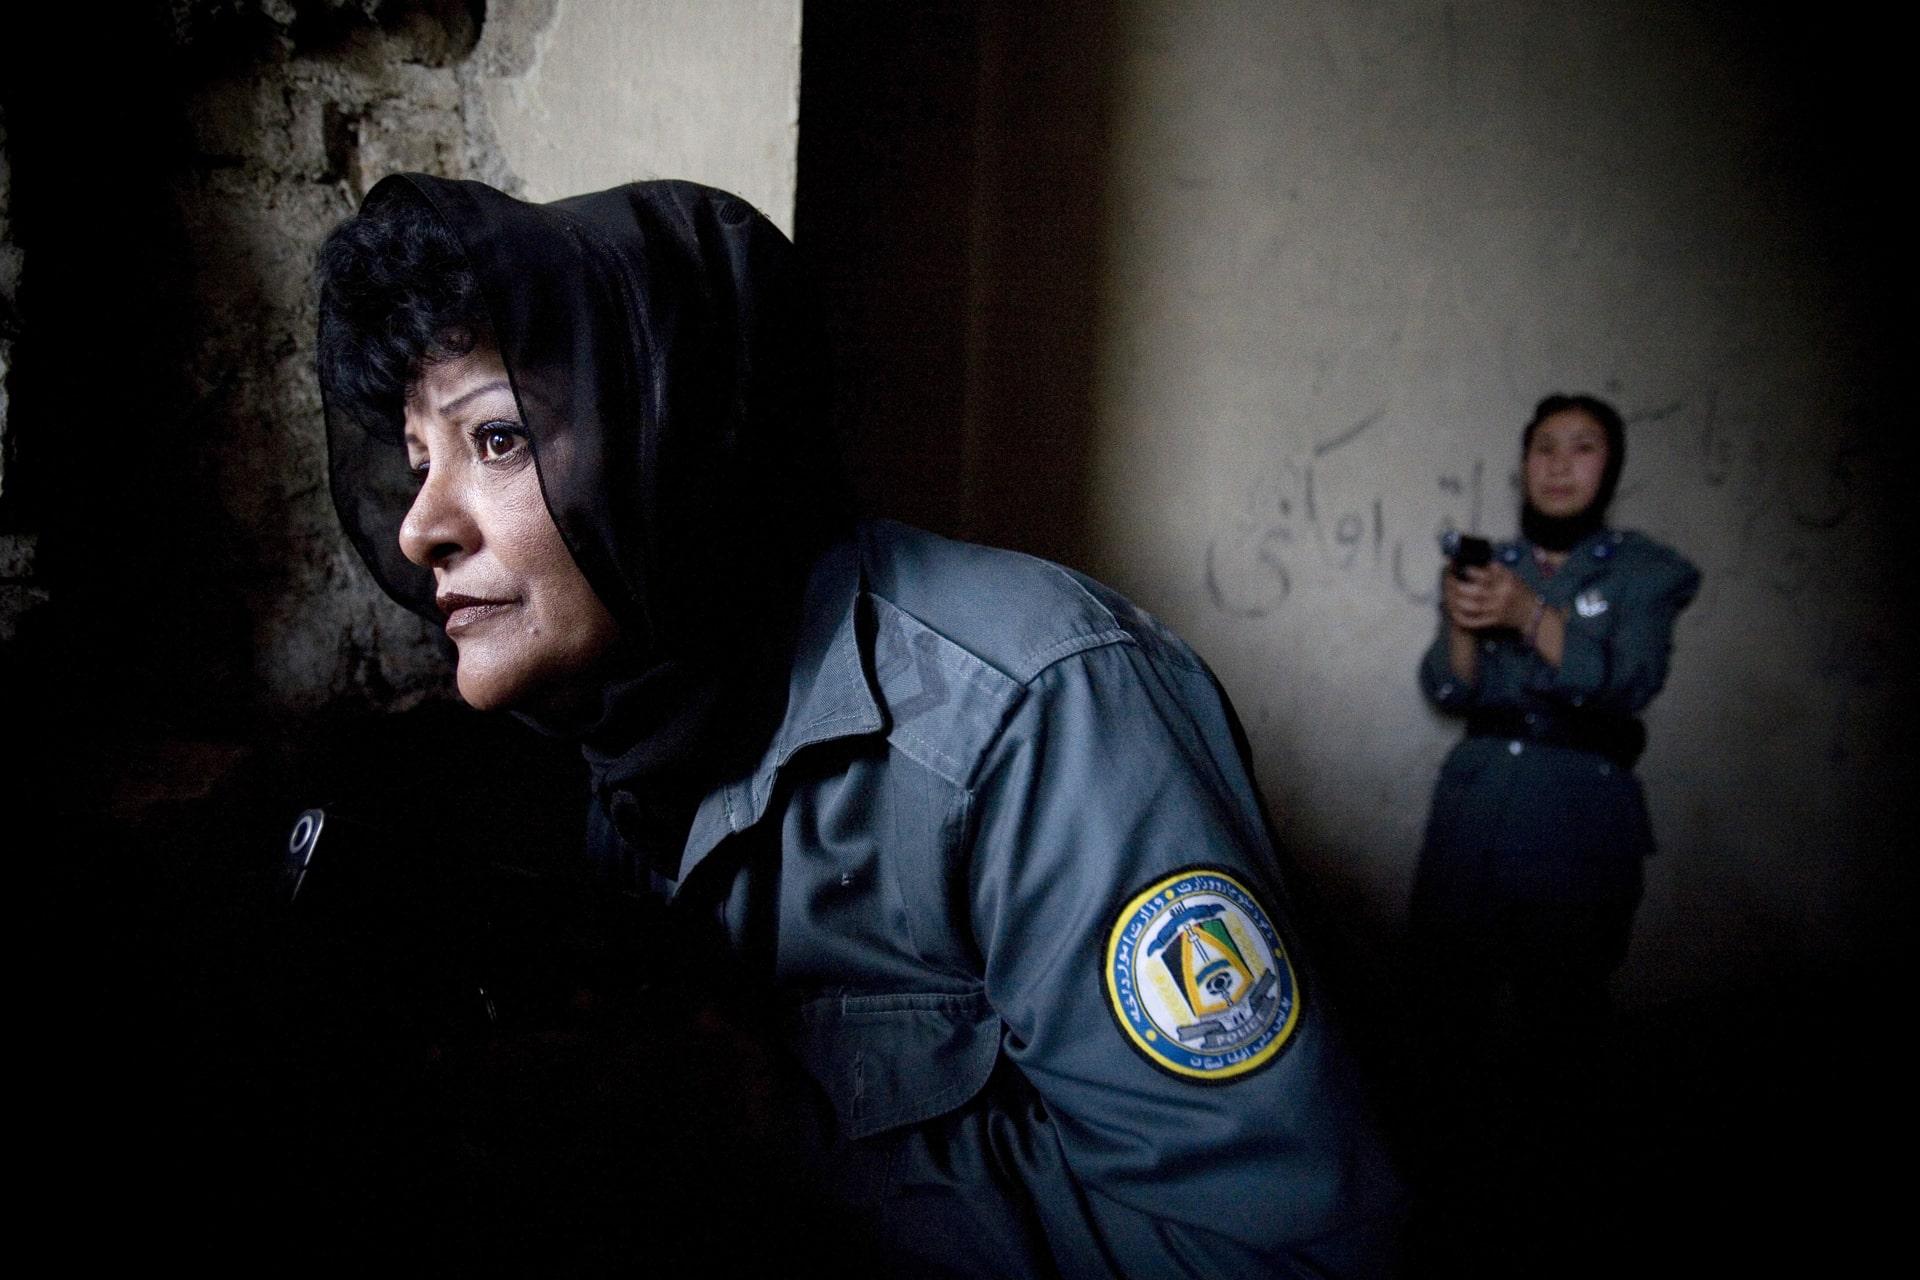 Women's Police Unit in Afghanistan